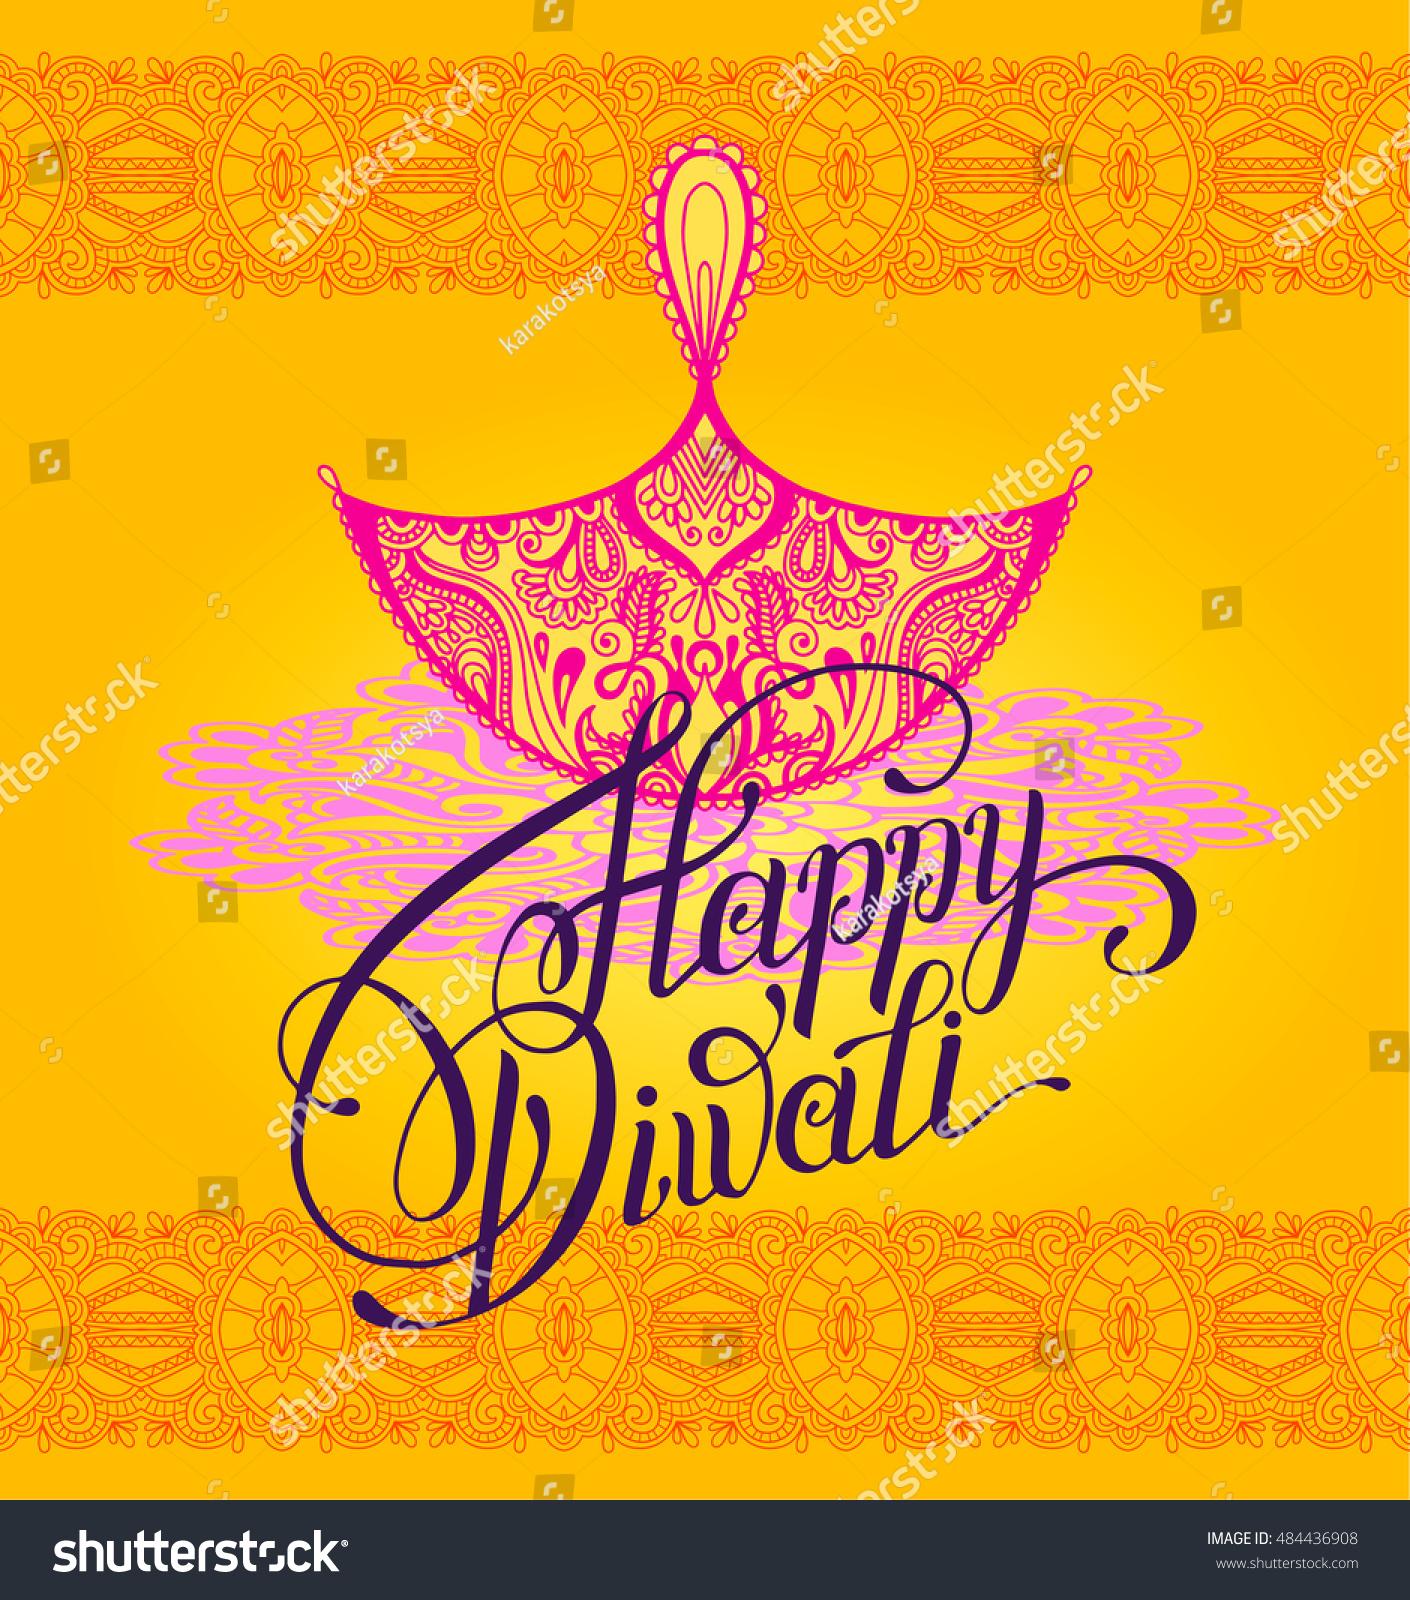 Happy diwali greeting card paisley ornamental stock vector 484436908 happy diwali greeting card paisley ornamental stock vector 484436908 shutterstock m4hsunfo